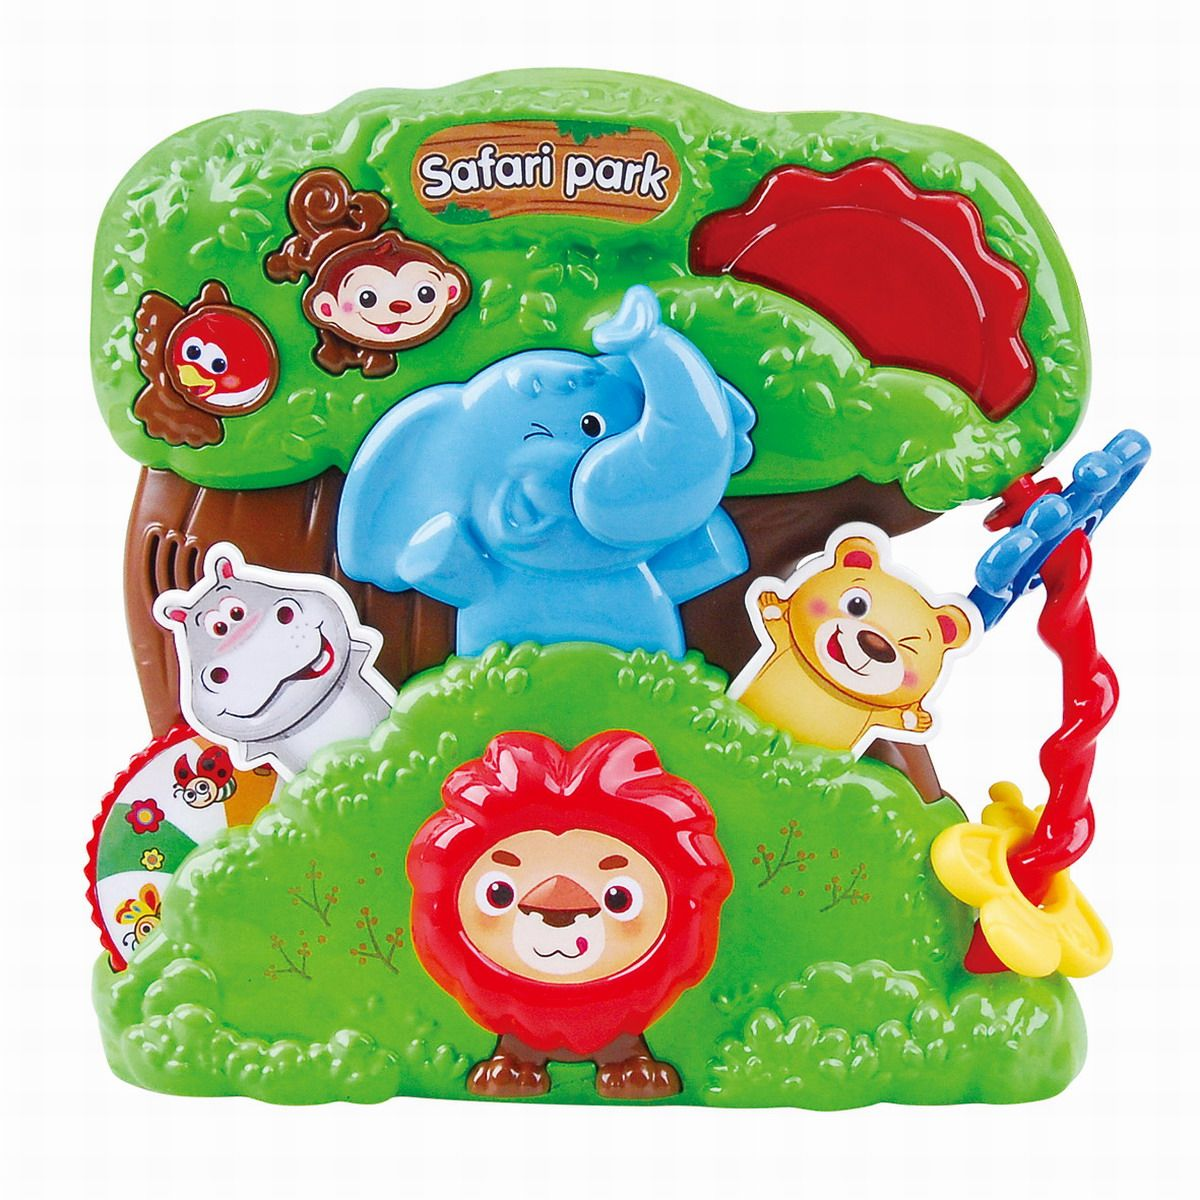 Playgo Развивающая игрушка Сафари парк развивающие игрушки playgo сафари парк